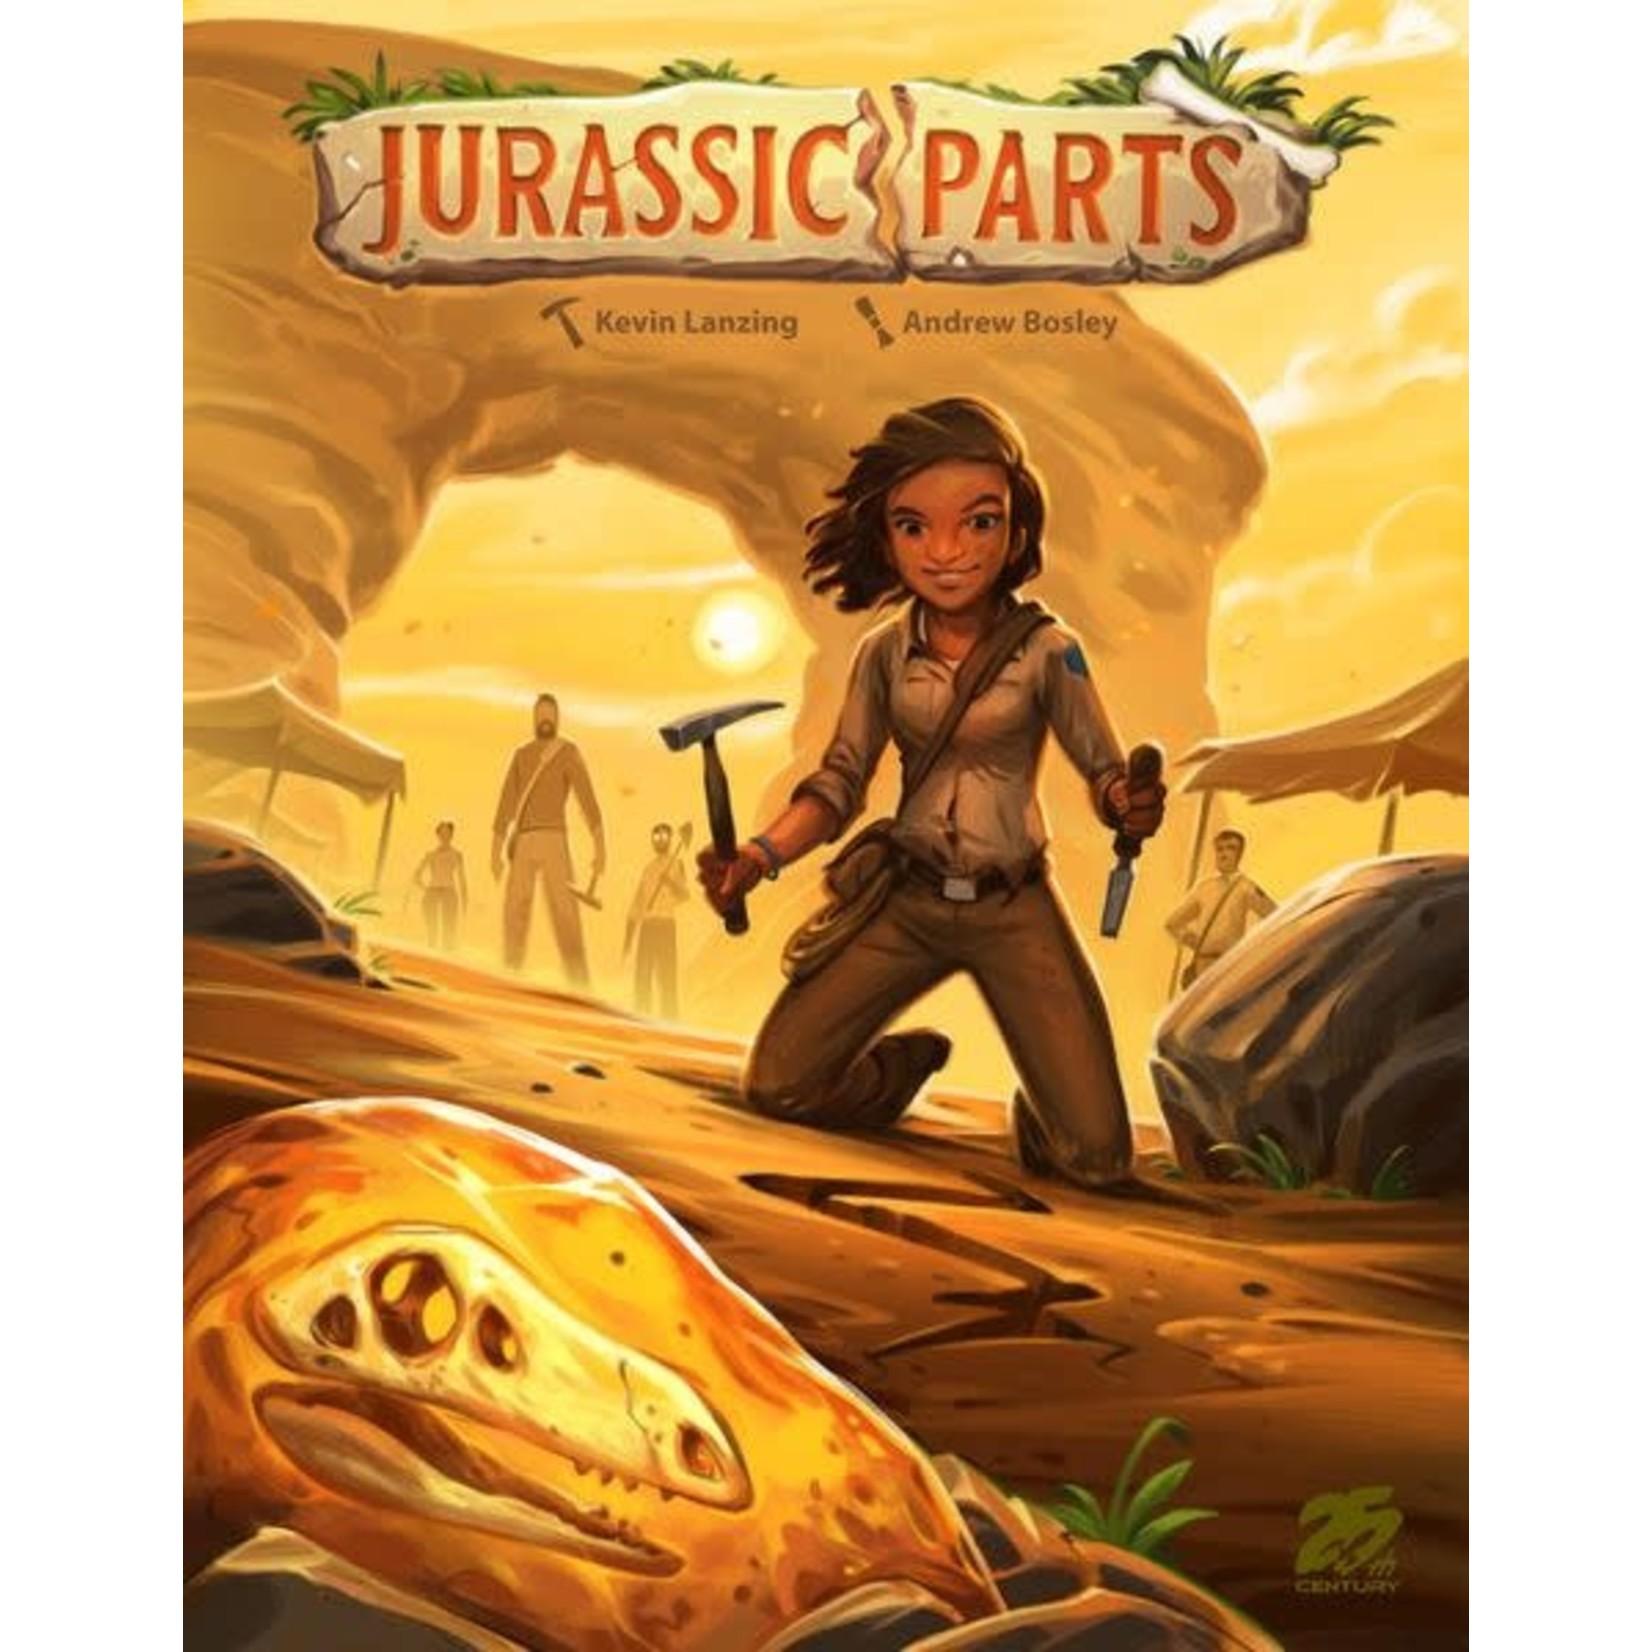 25 Century Games Jurassic Parts